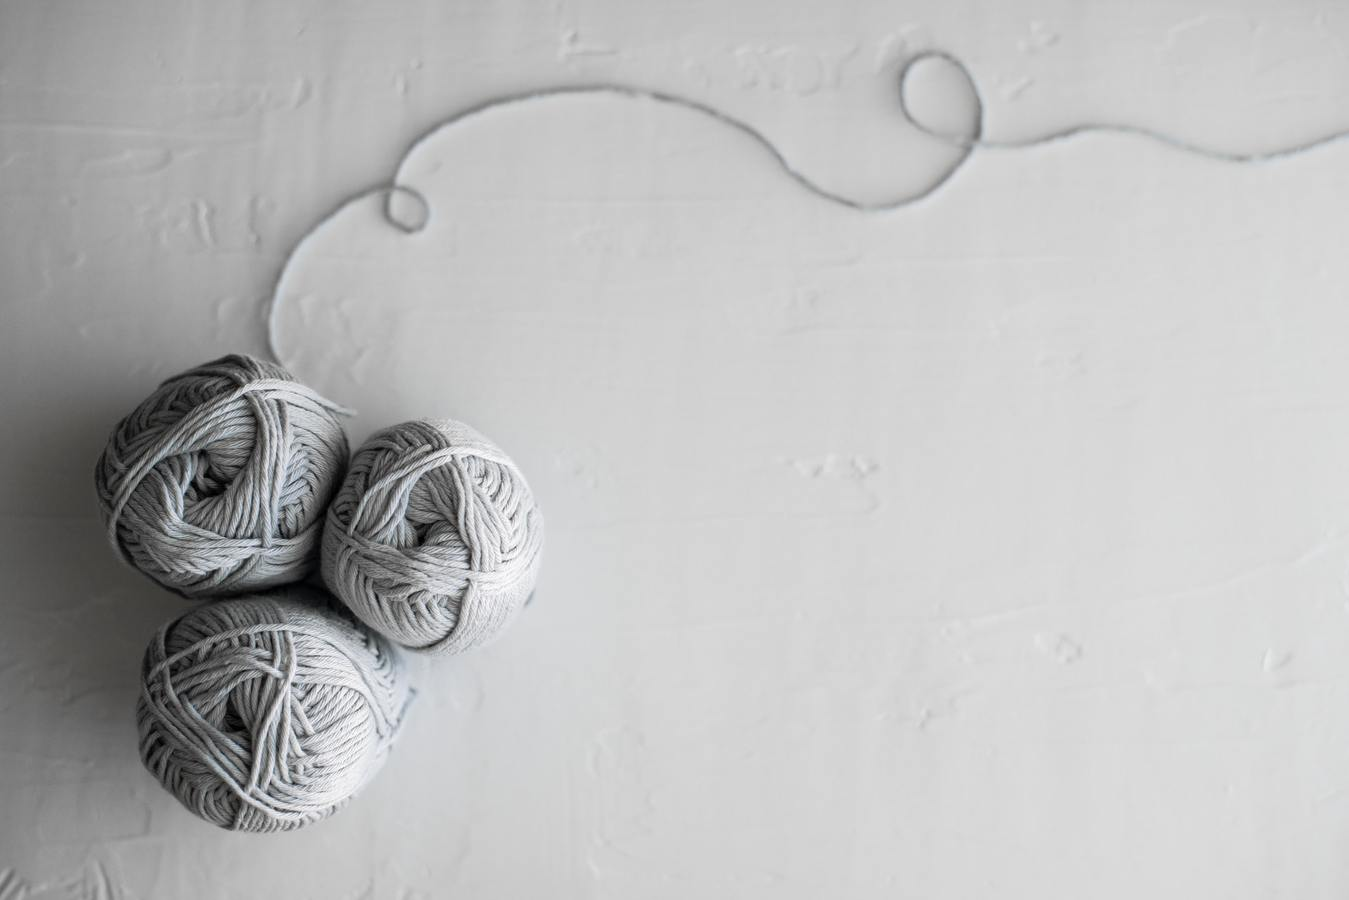 Drie ballen grijze wol